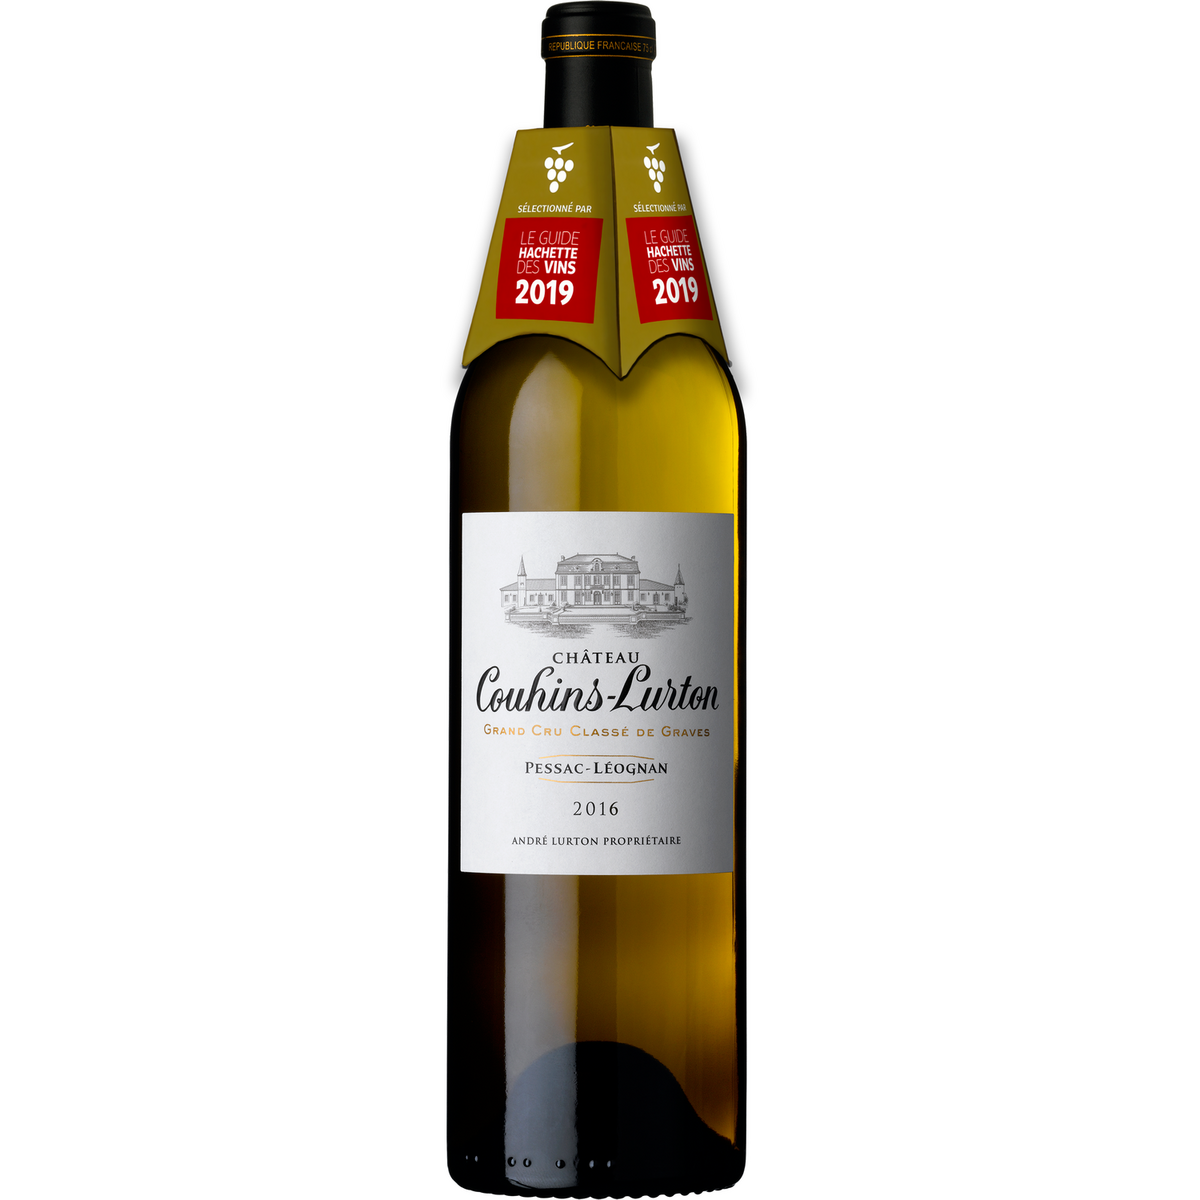 AOP Pessac-Léognan Château Couhins Lurton Grand Cru Classé blanc 2016